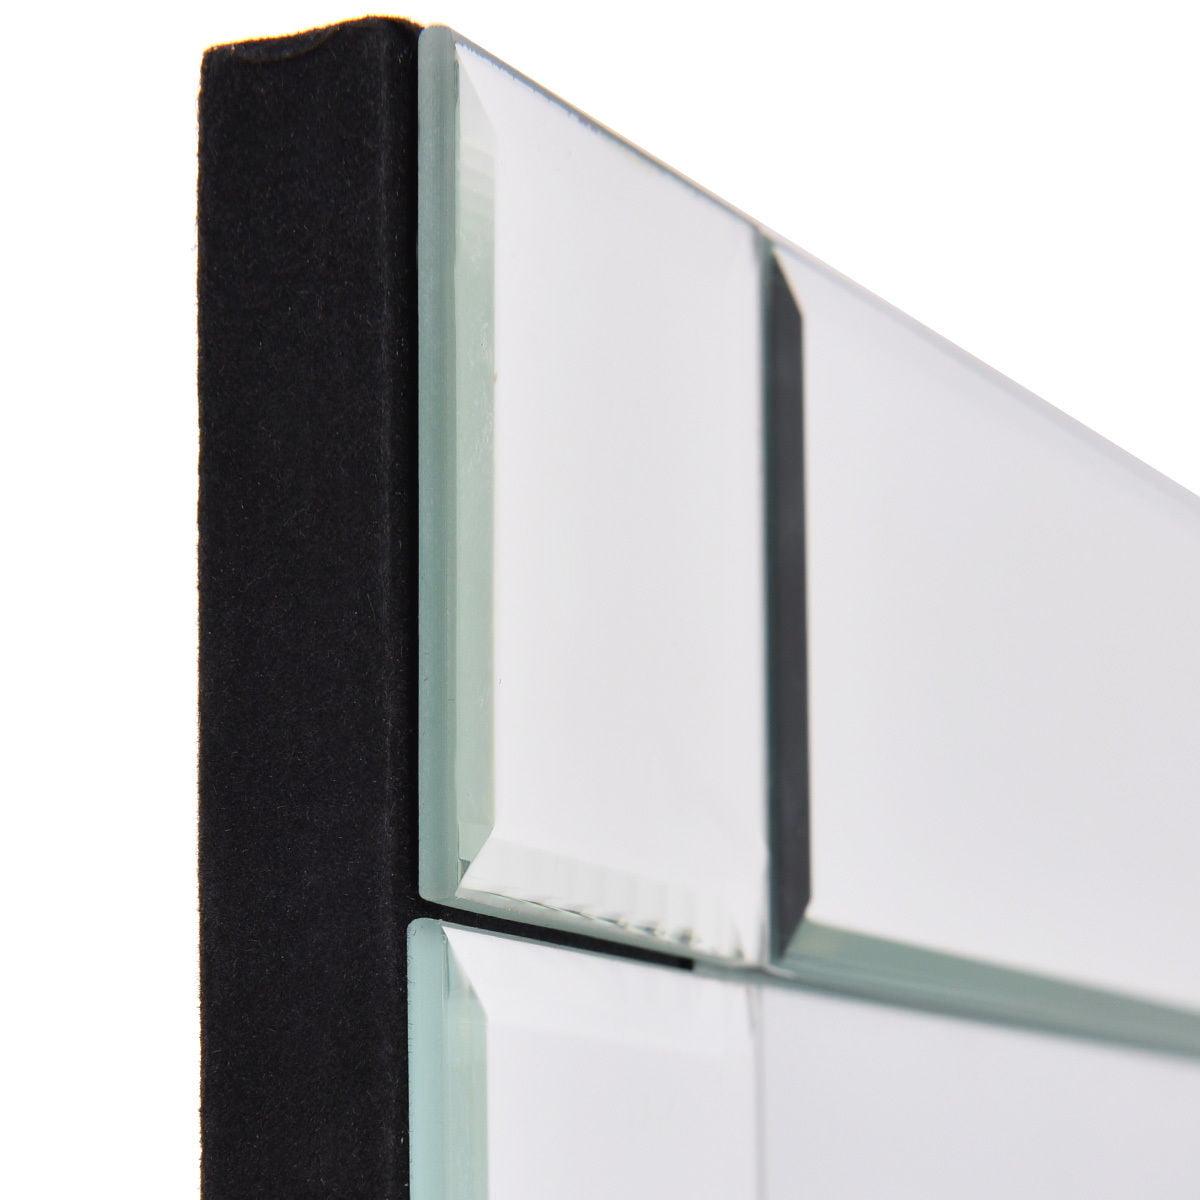 36'' Wall Mirror Rectangle Vanity Makeup Mirror Decor MDF Frame Bathroom Home - image 6 of 8